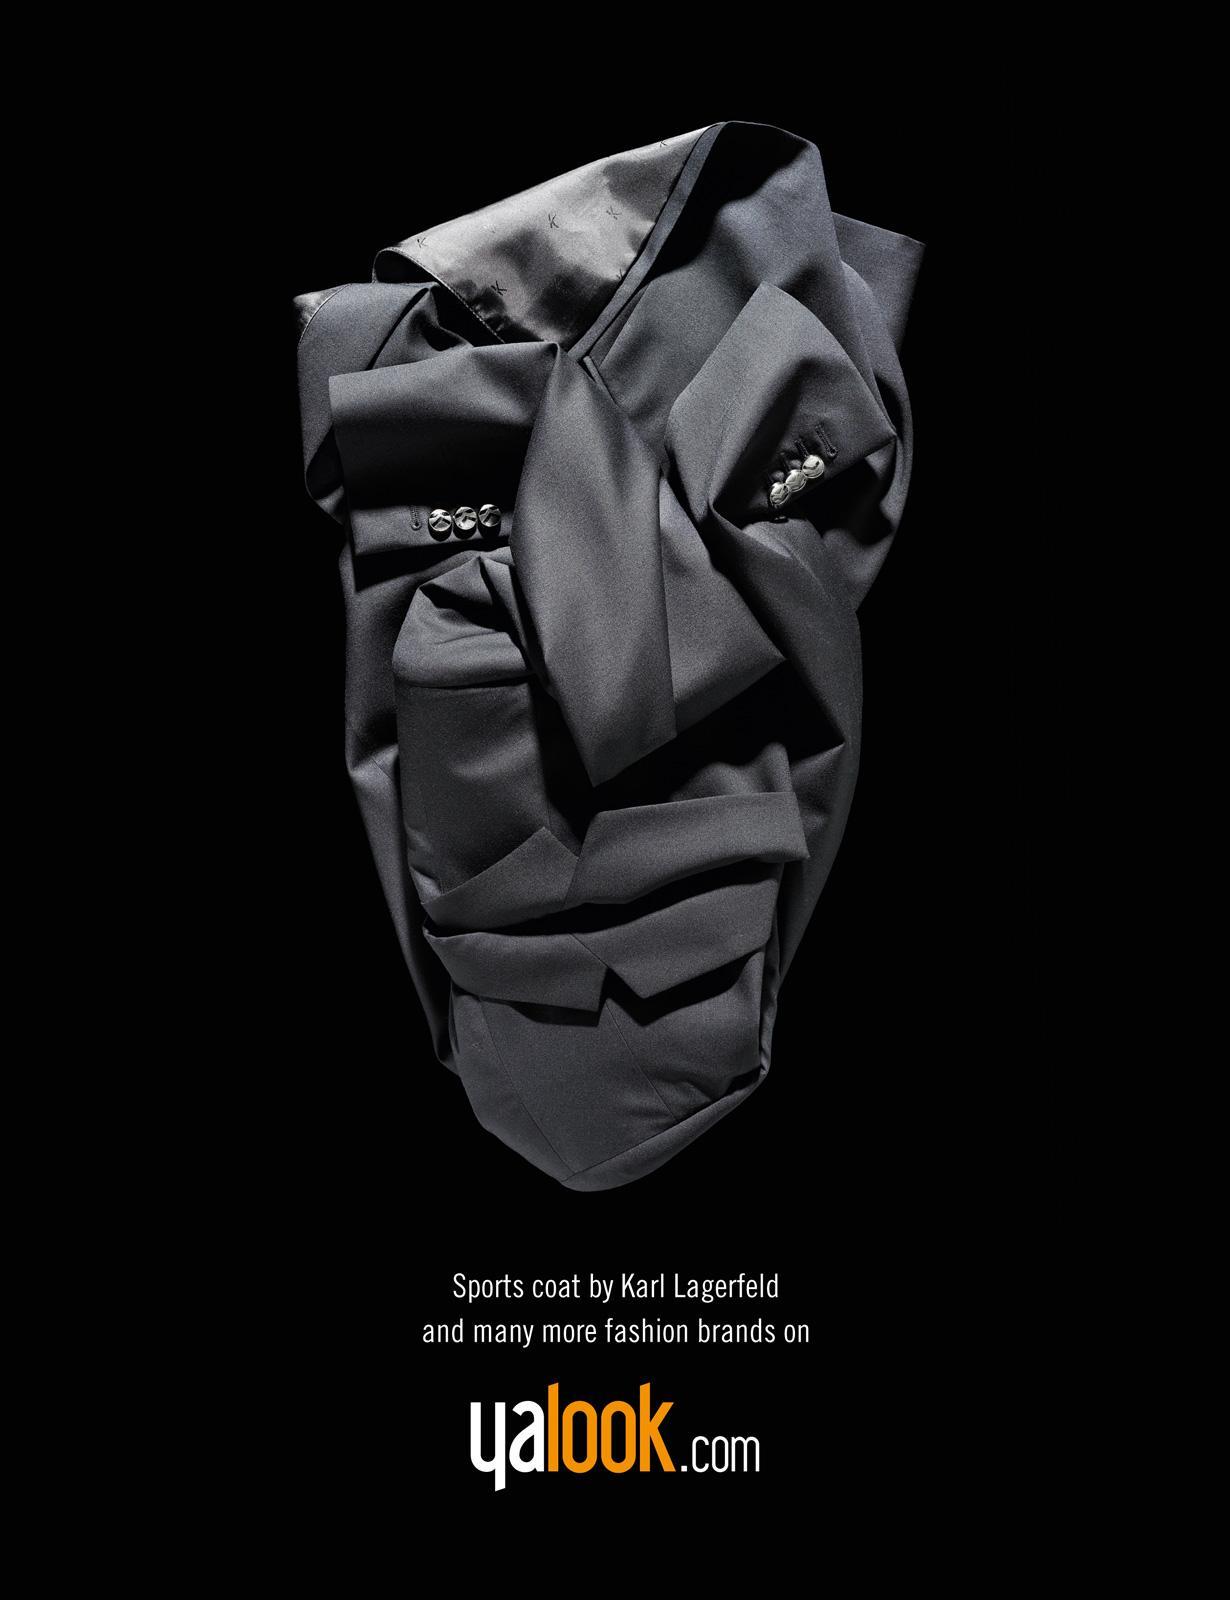 Yalook.com Print Ad -  Fashion Faces, Karl Lagerfeld